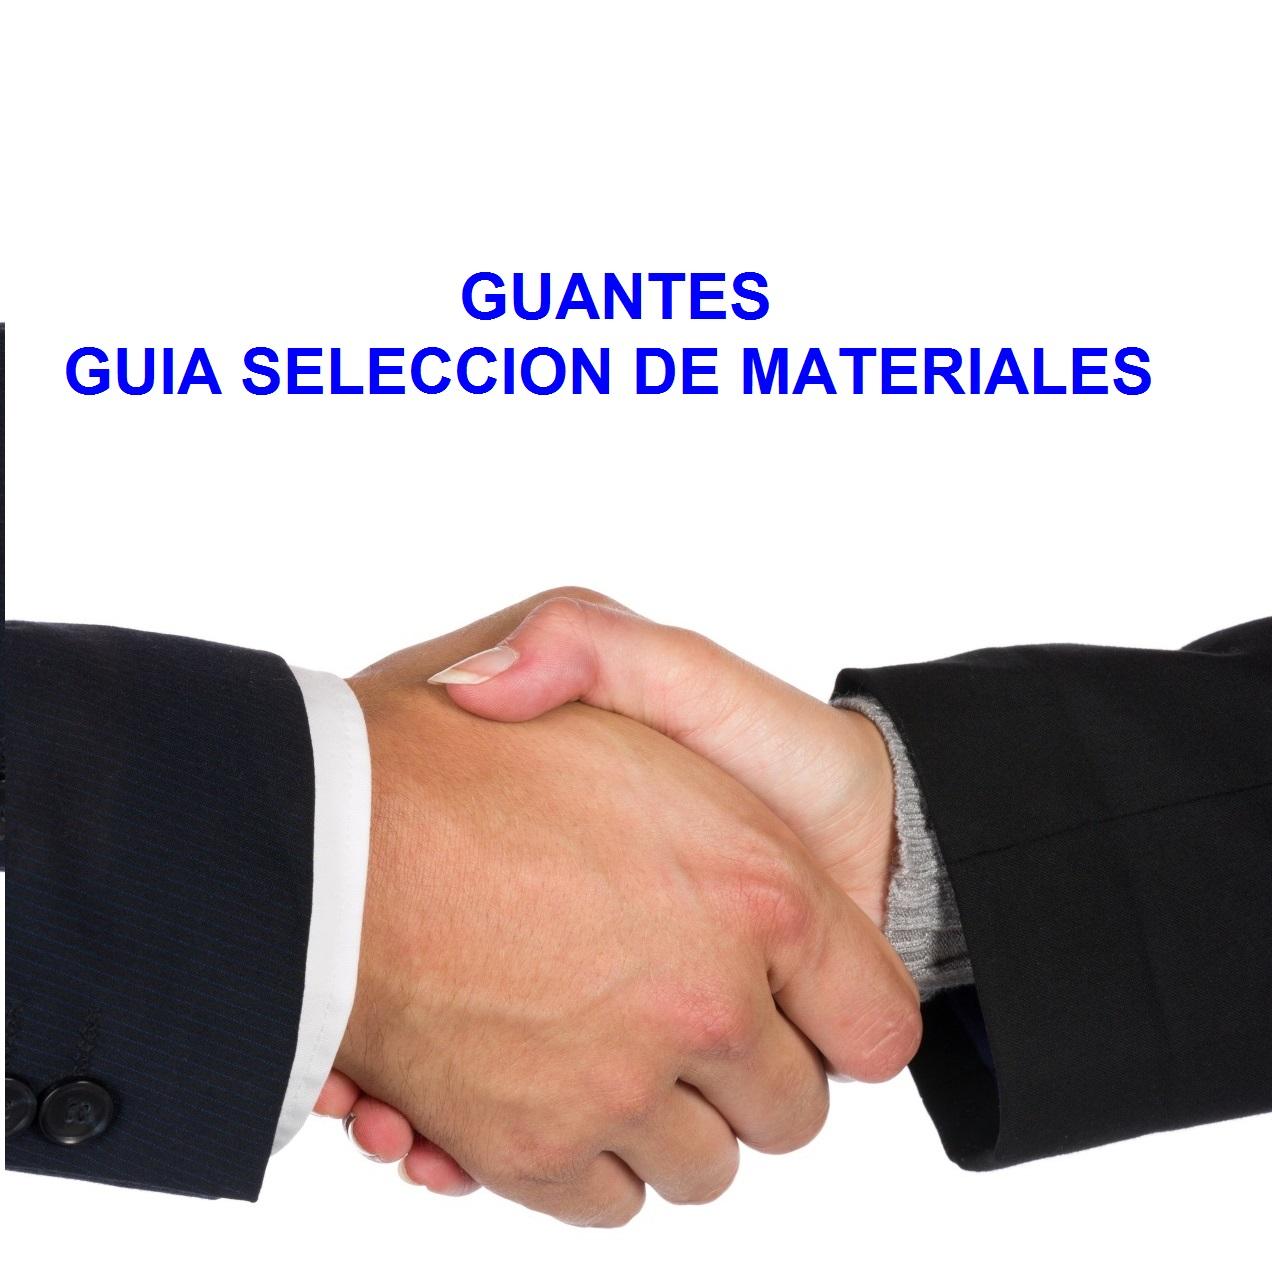 GUANTES - MANUAL SELECCION DE MATERIALES